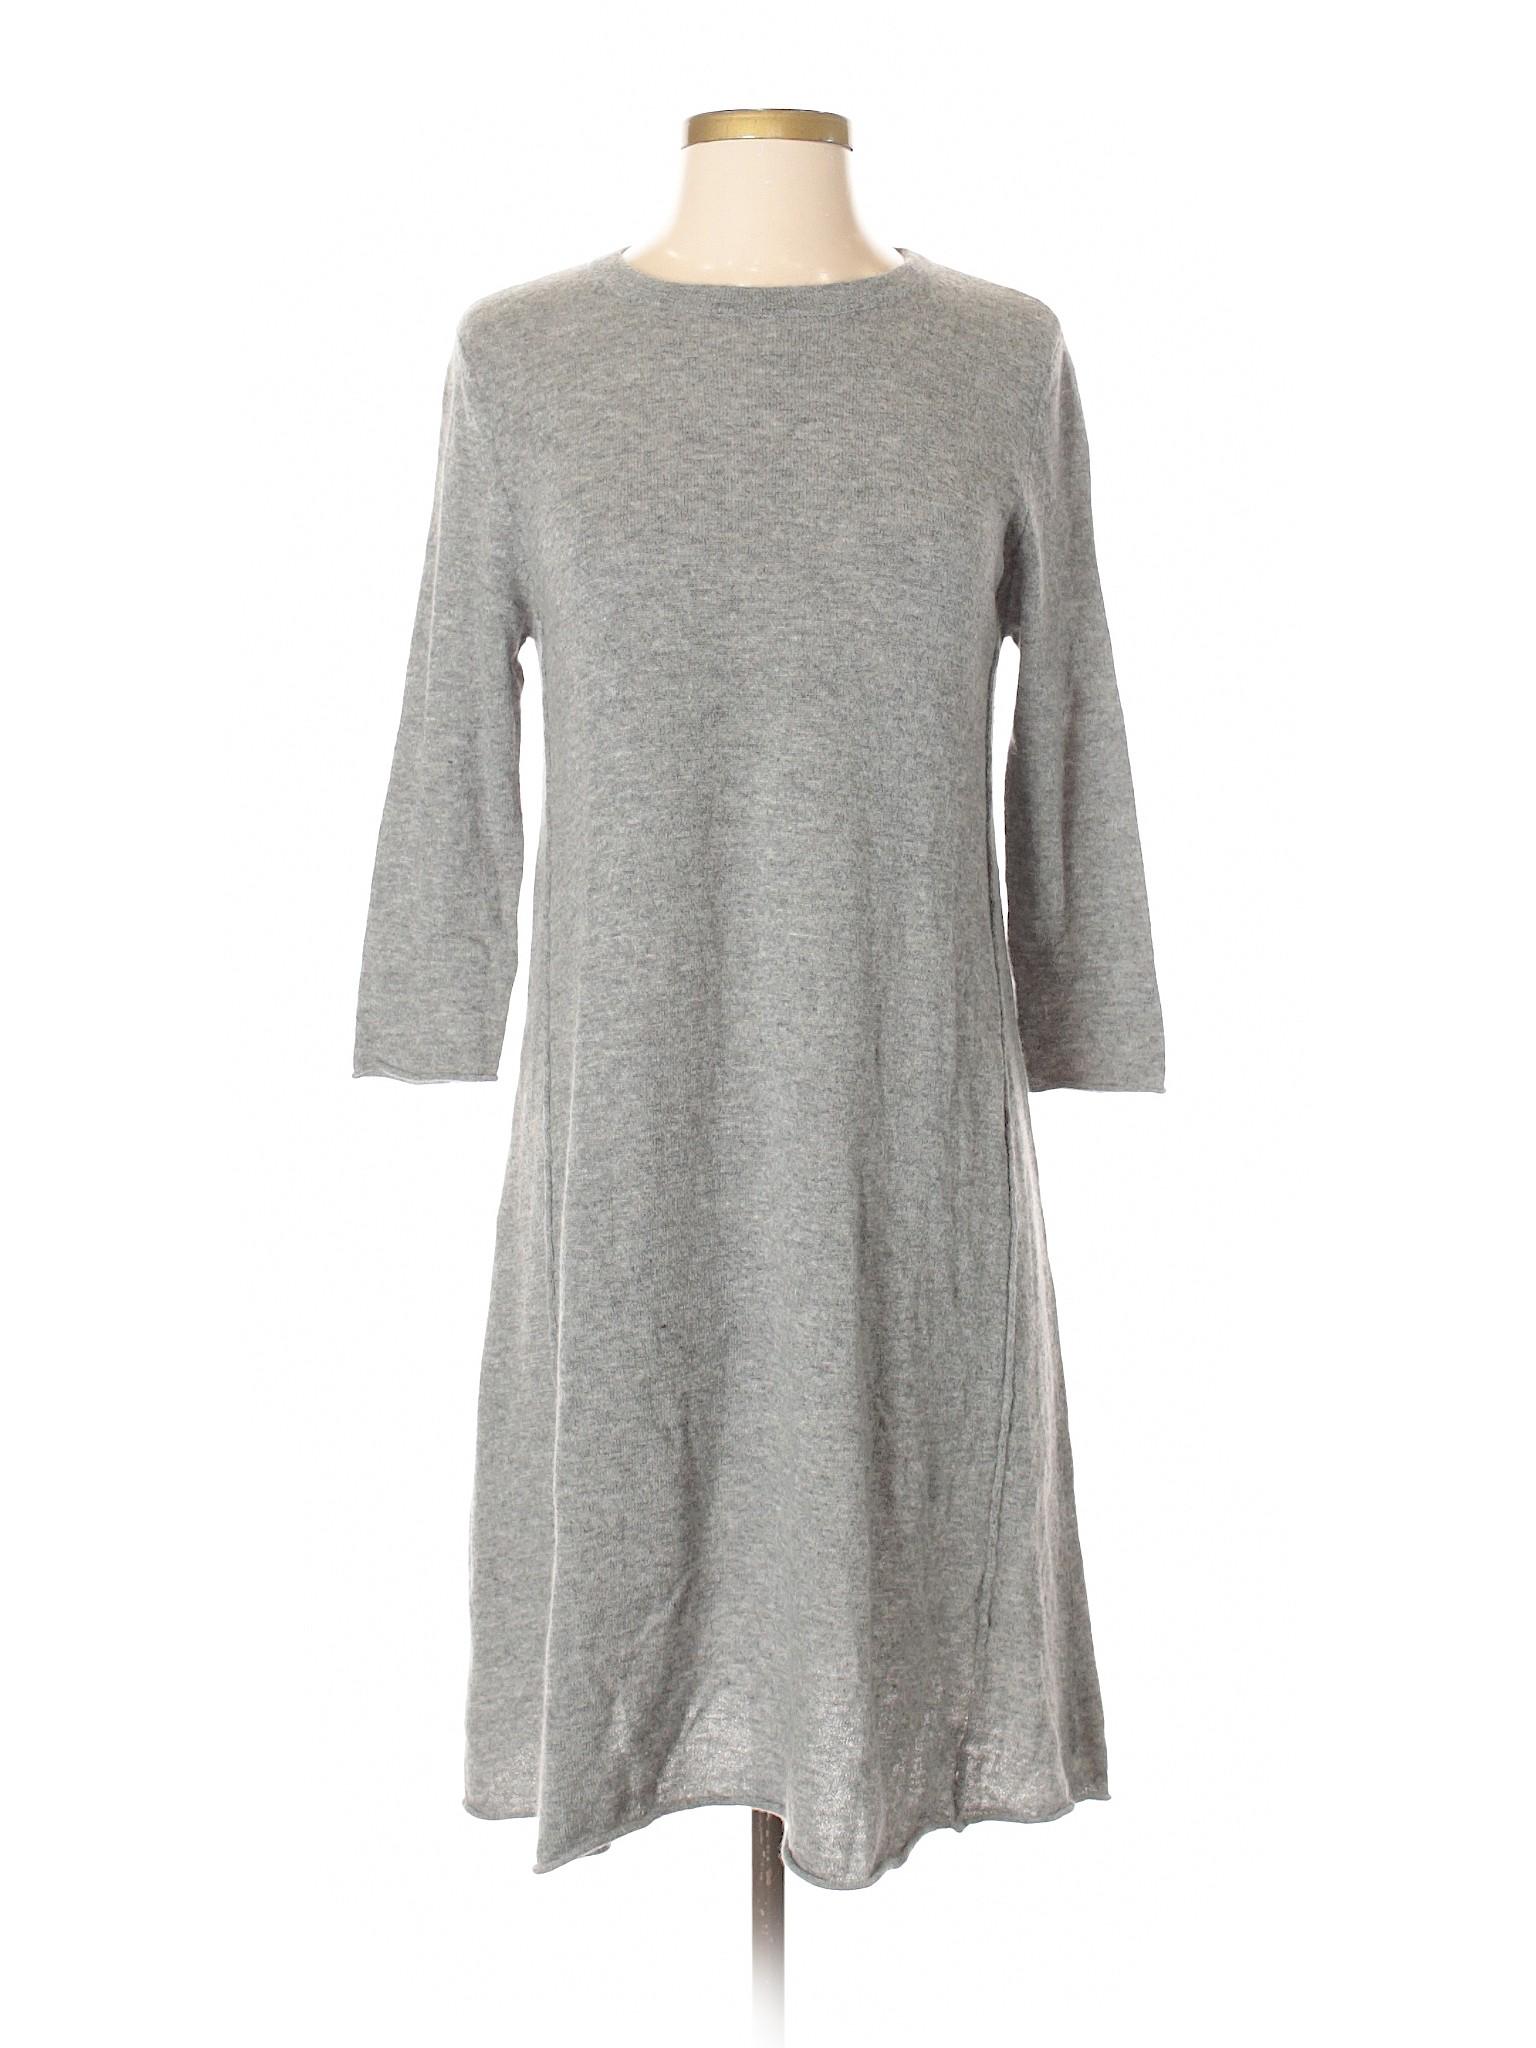 Dress winter Autumn Cashmere Boutique Casual zaOqn8A